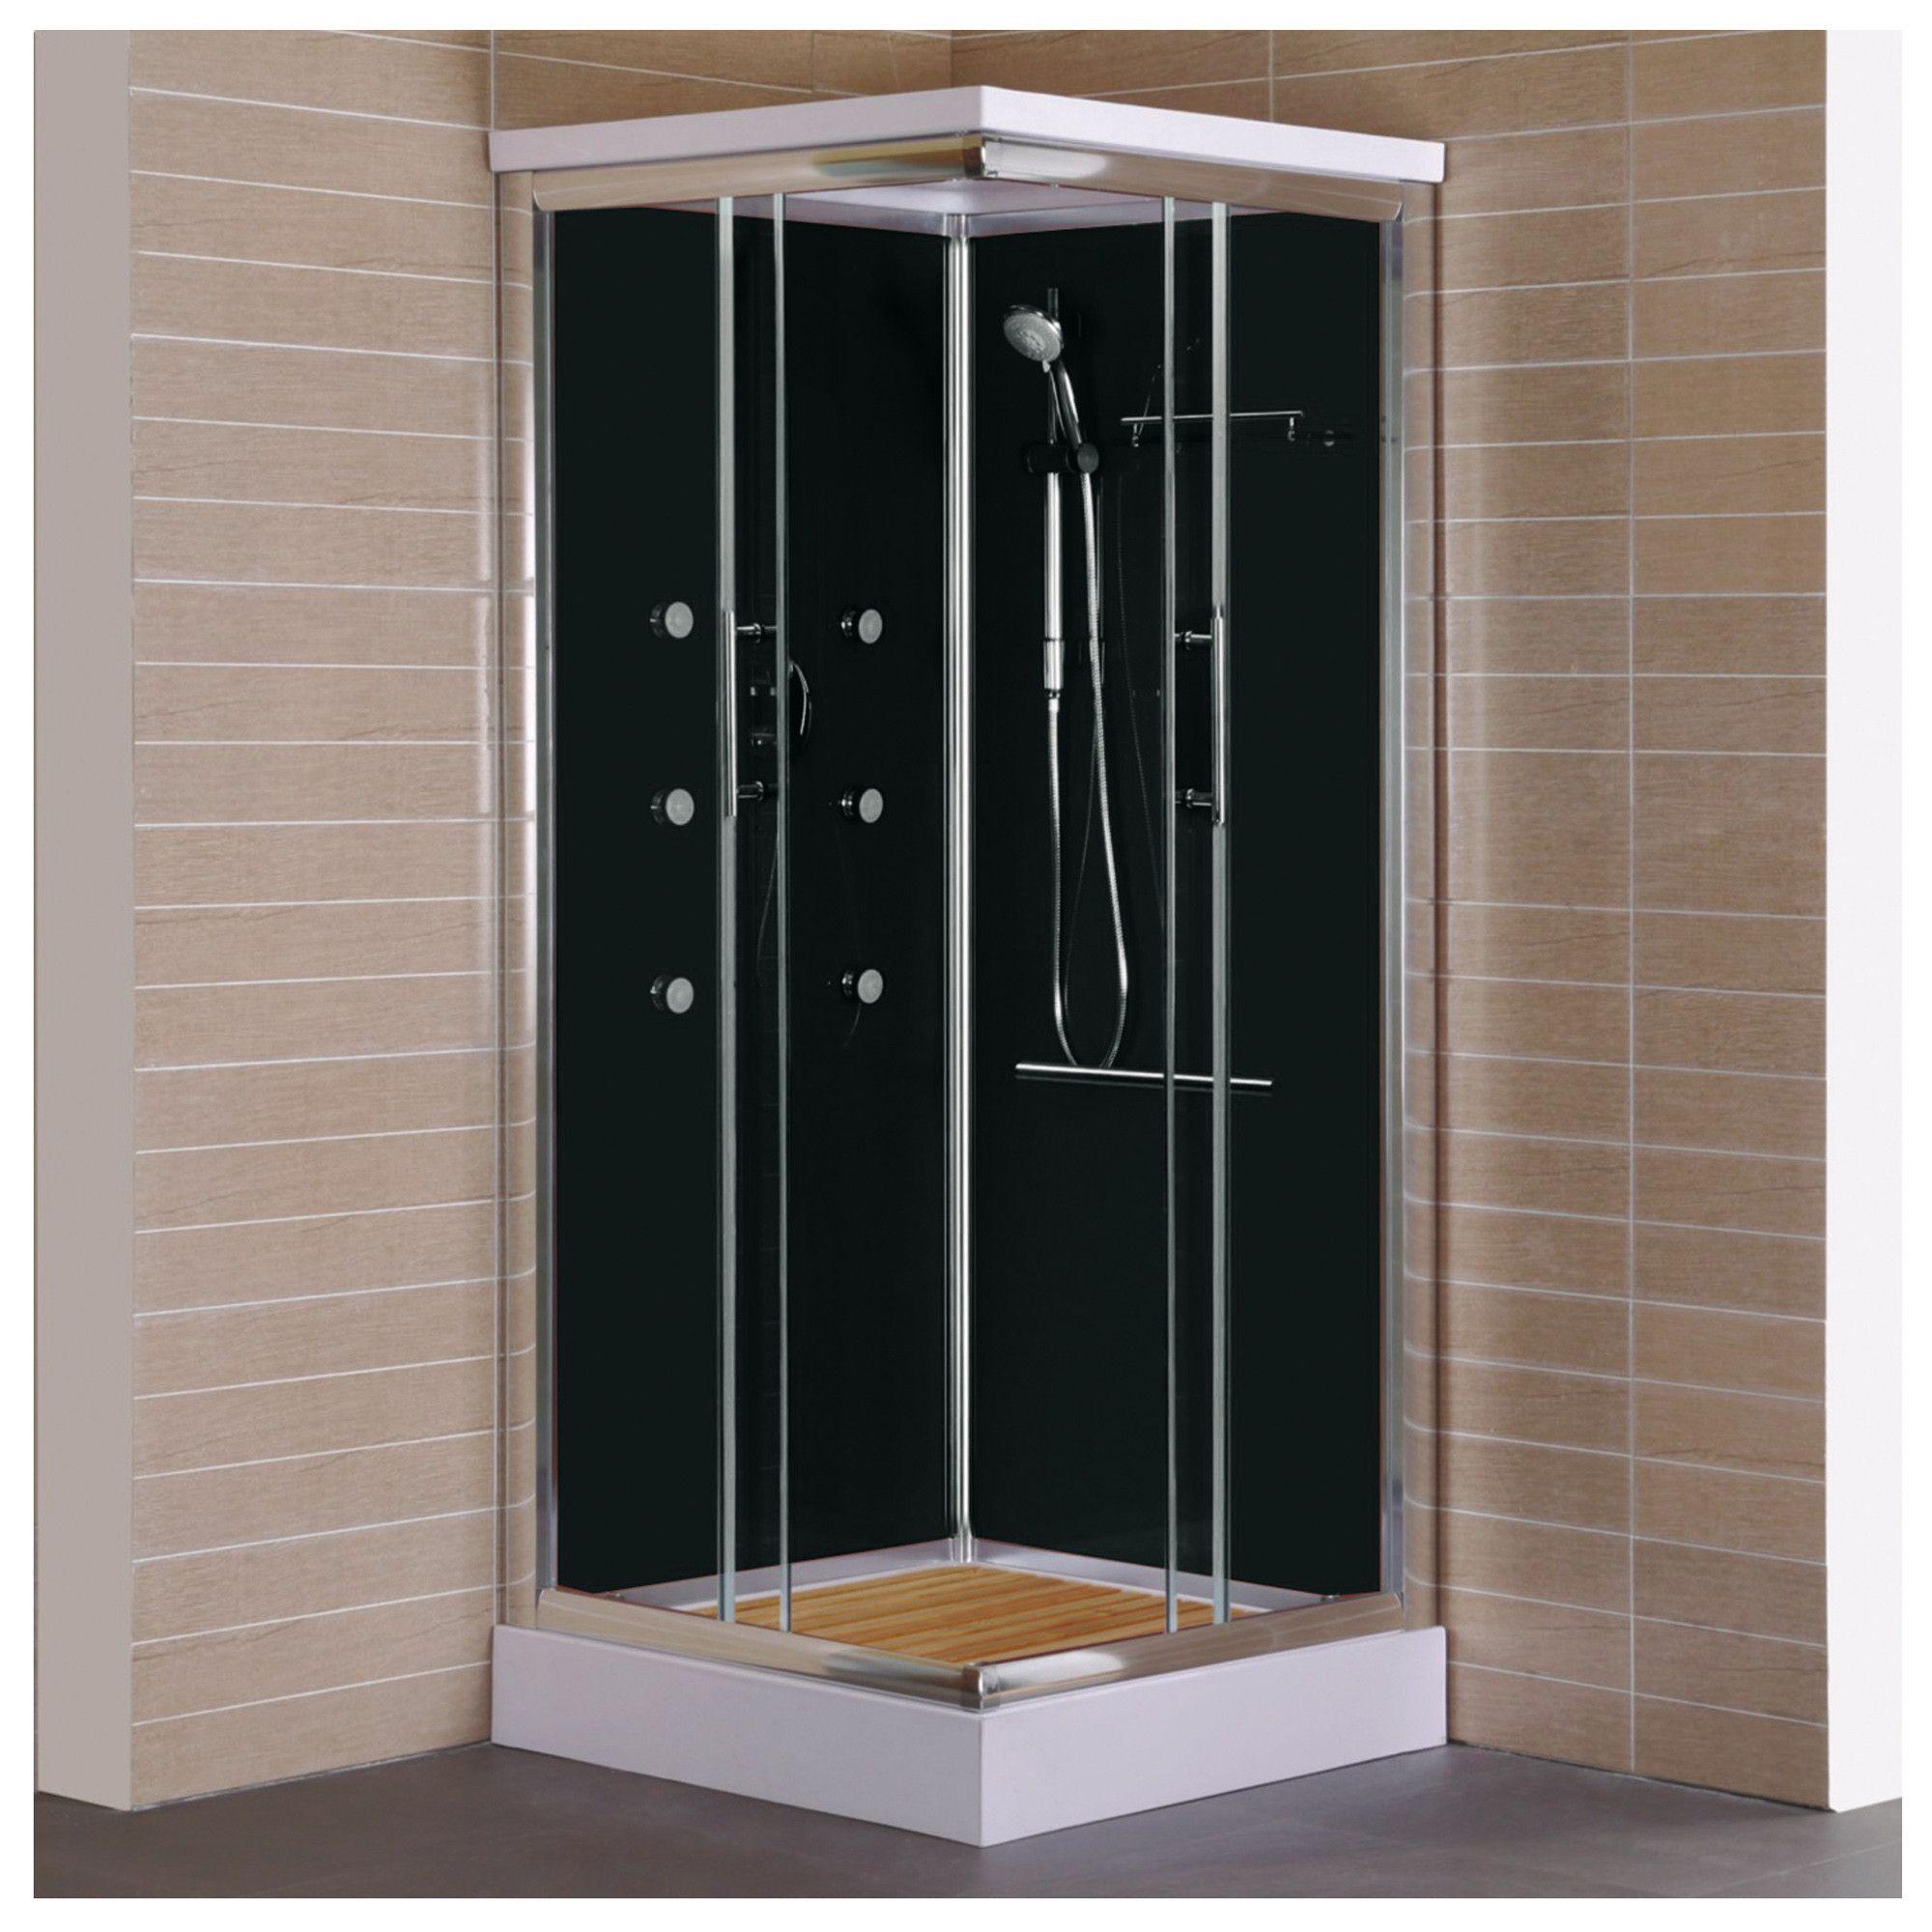 Sensi dacqua cabina de ducha 90x90x218 cm homecenter for Instalacion cabina ducha